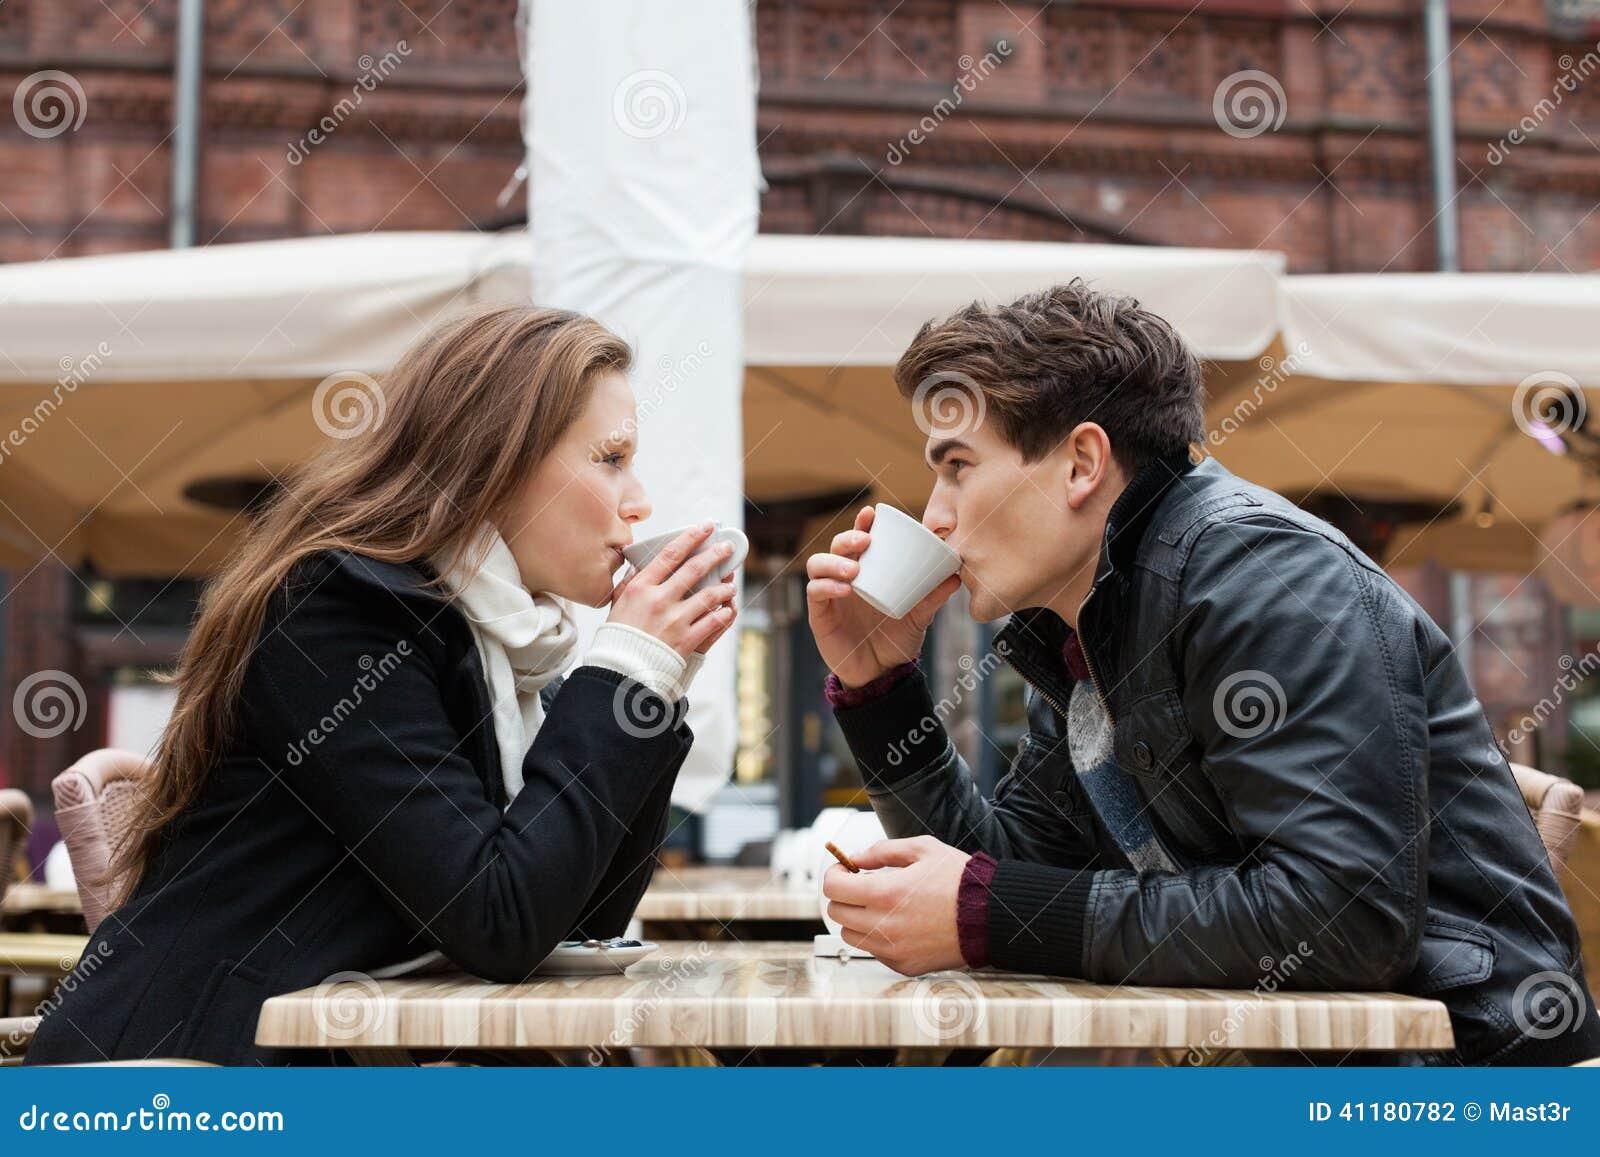 Couple Drinking Coffee Outdoor Restaurant Stock Photo